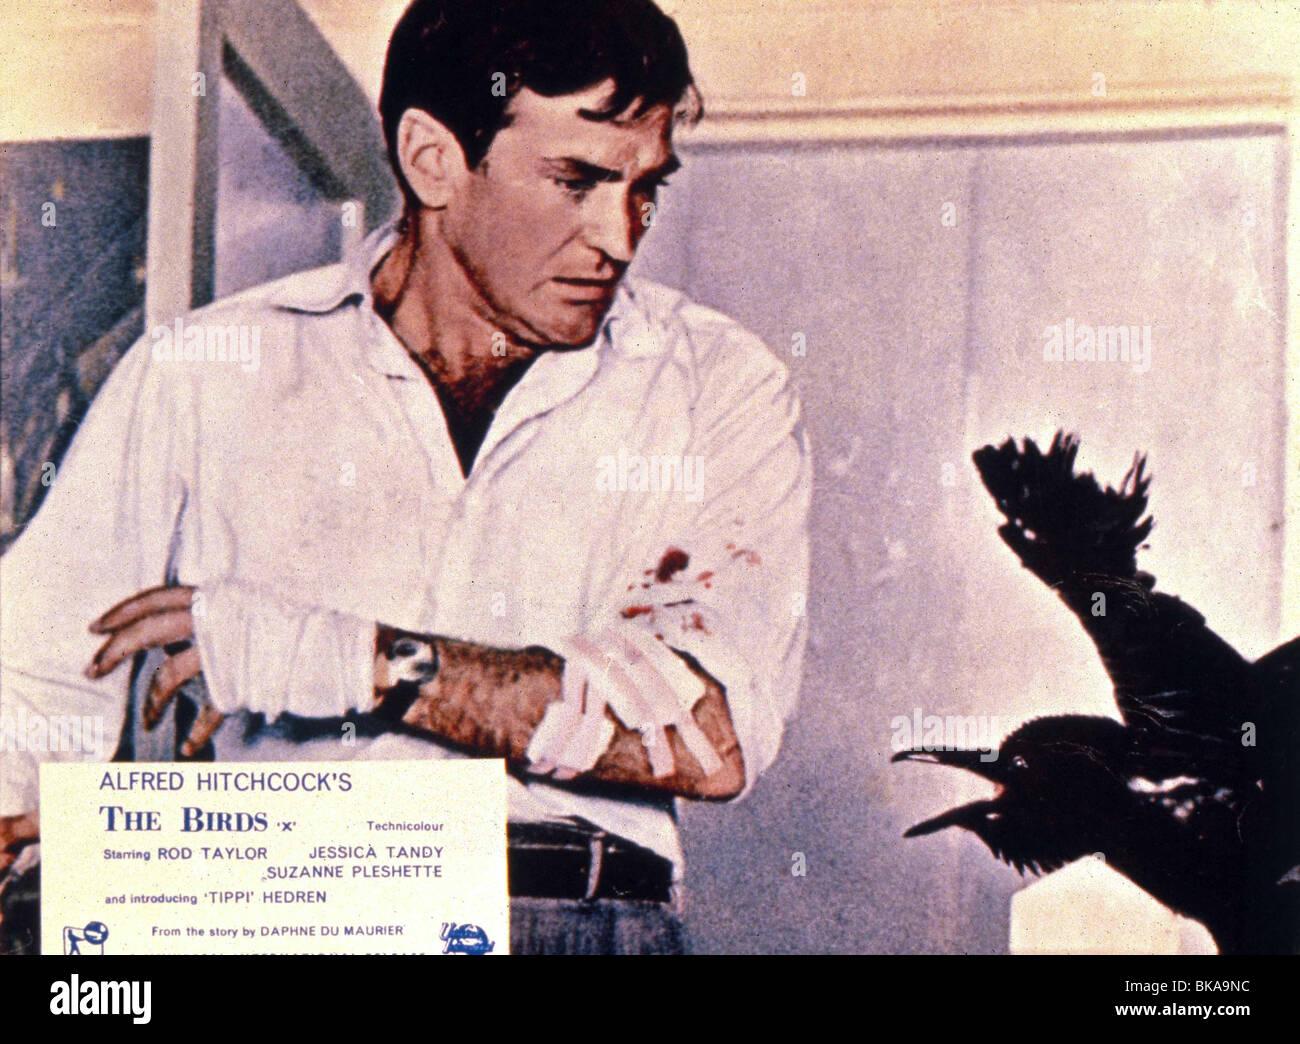 THE BIRDS -1963 ROD TAYLOR - Stock Image